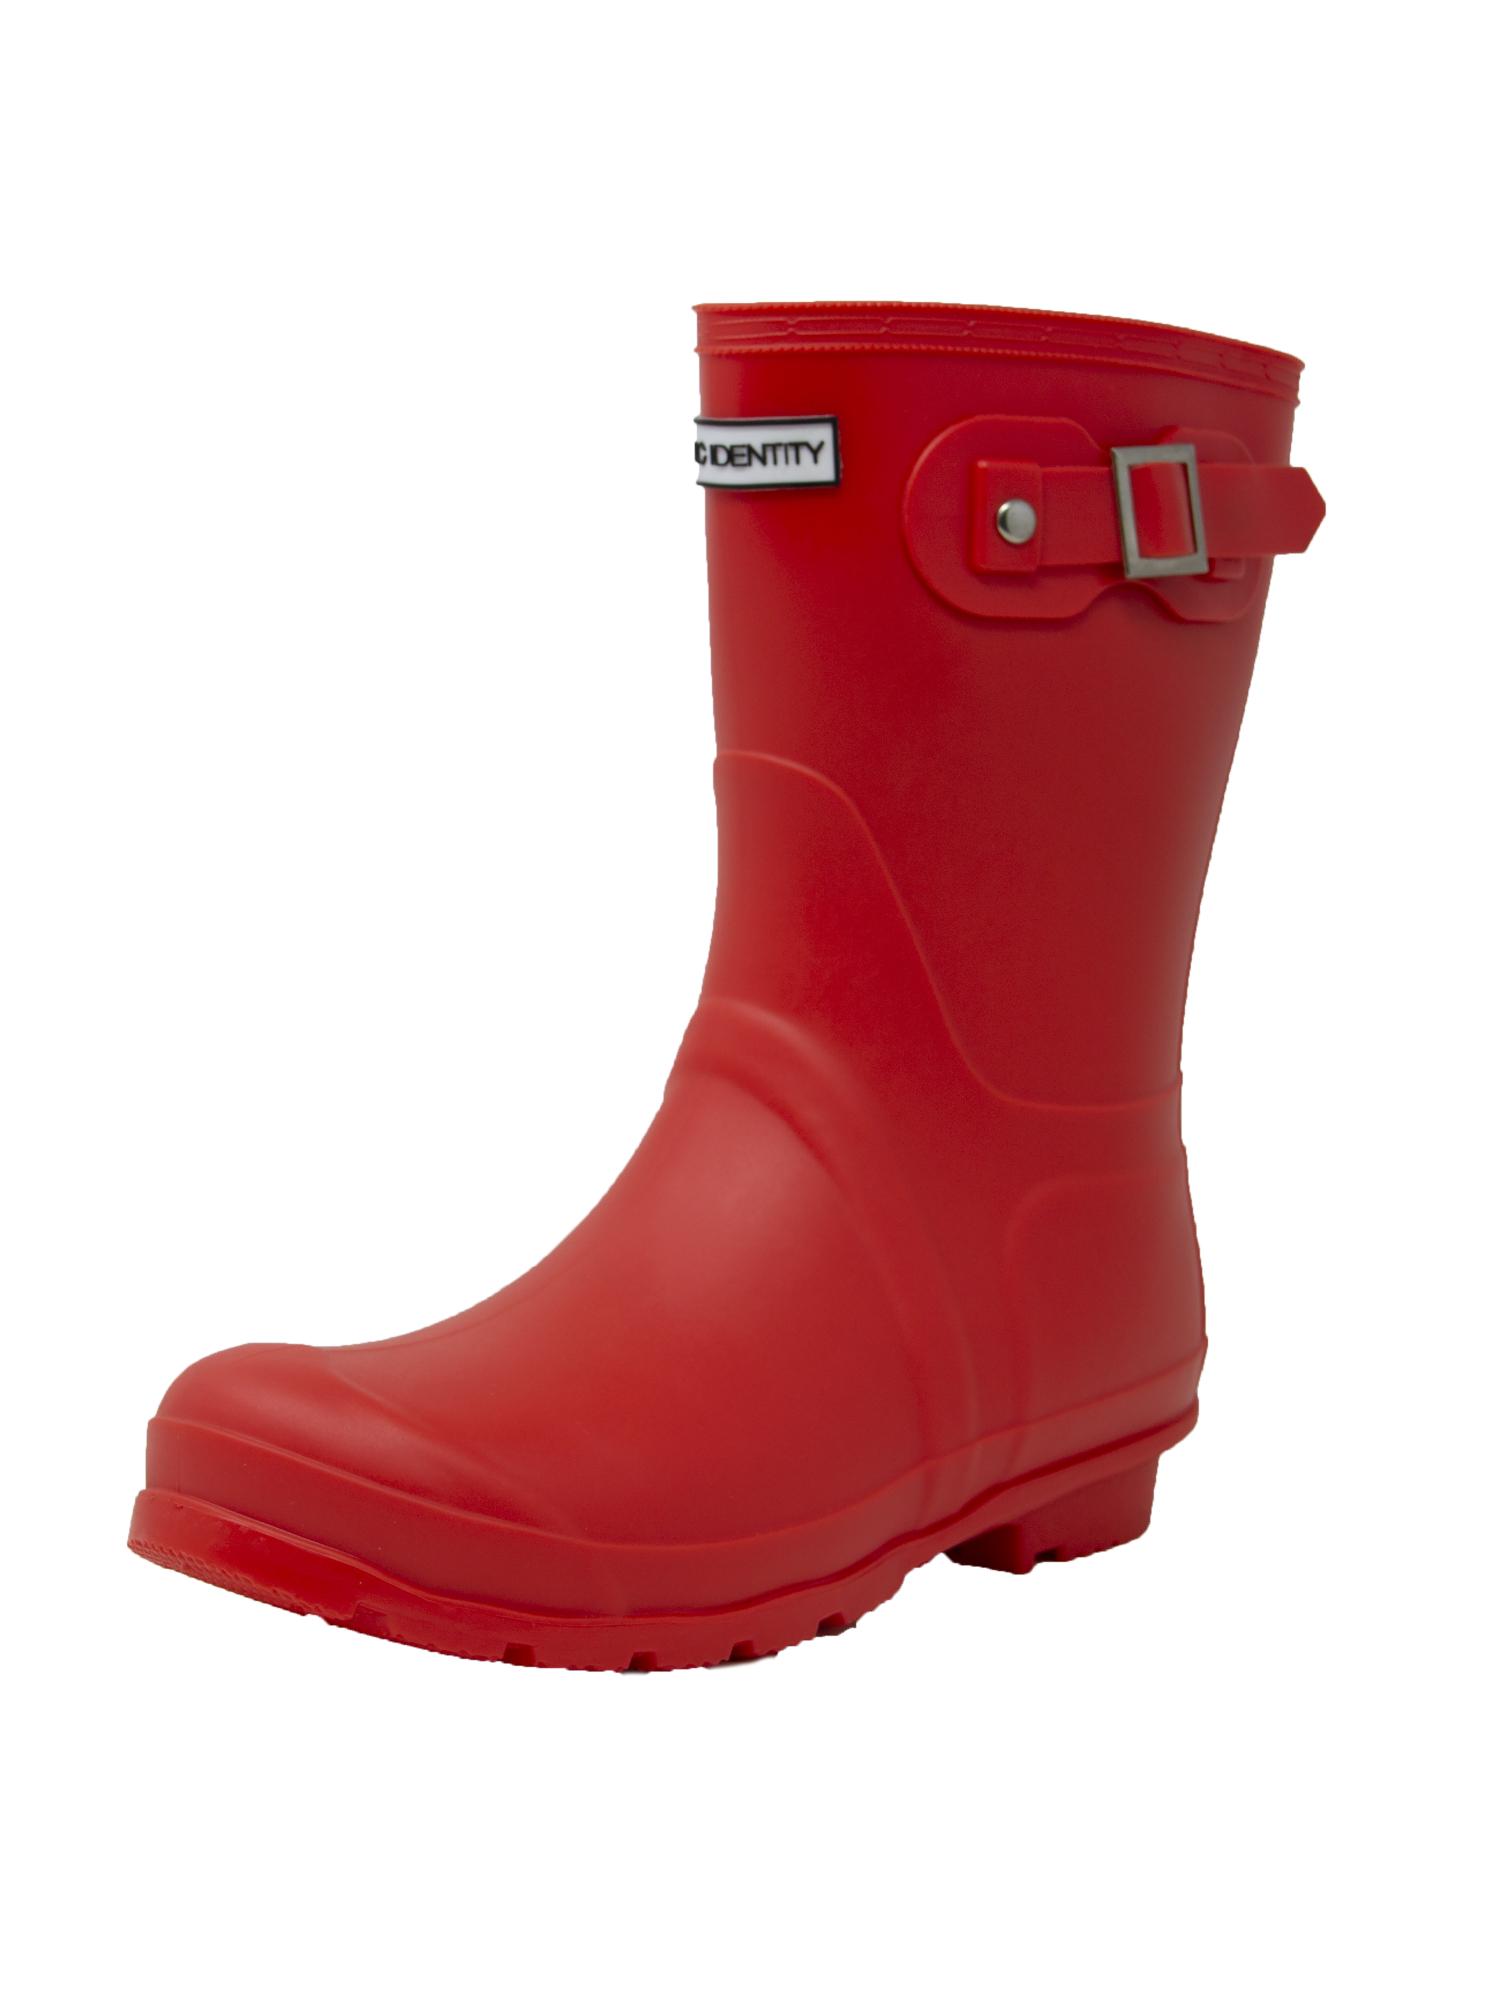 Exotic-Identity-Short-Rain-Boots-Non-Slip-100-Waterproof-for-Women thumbnail 18